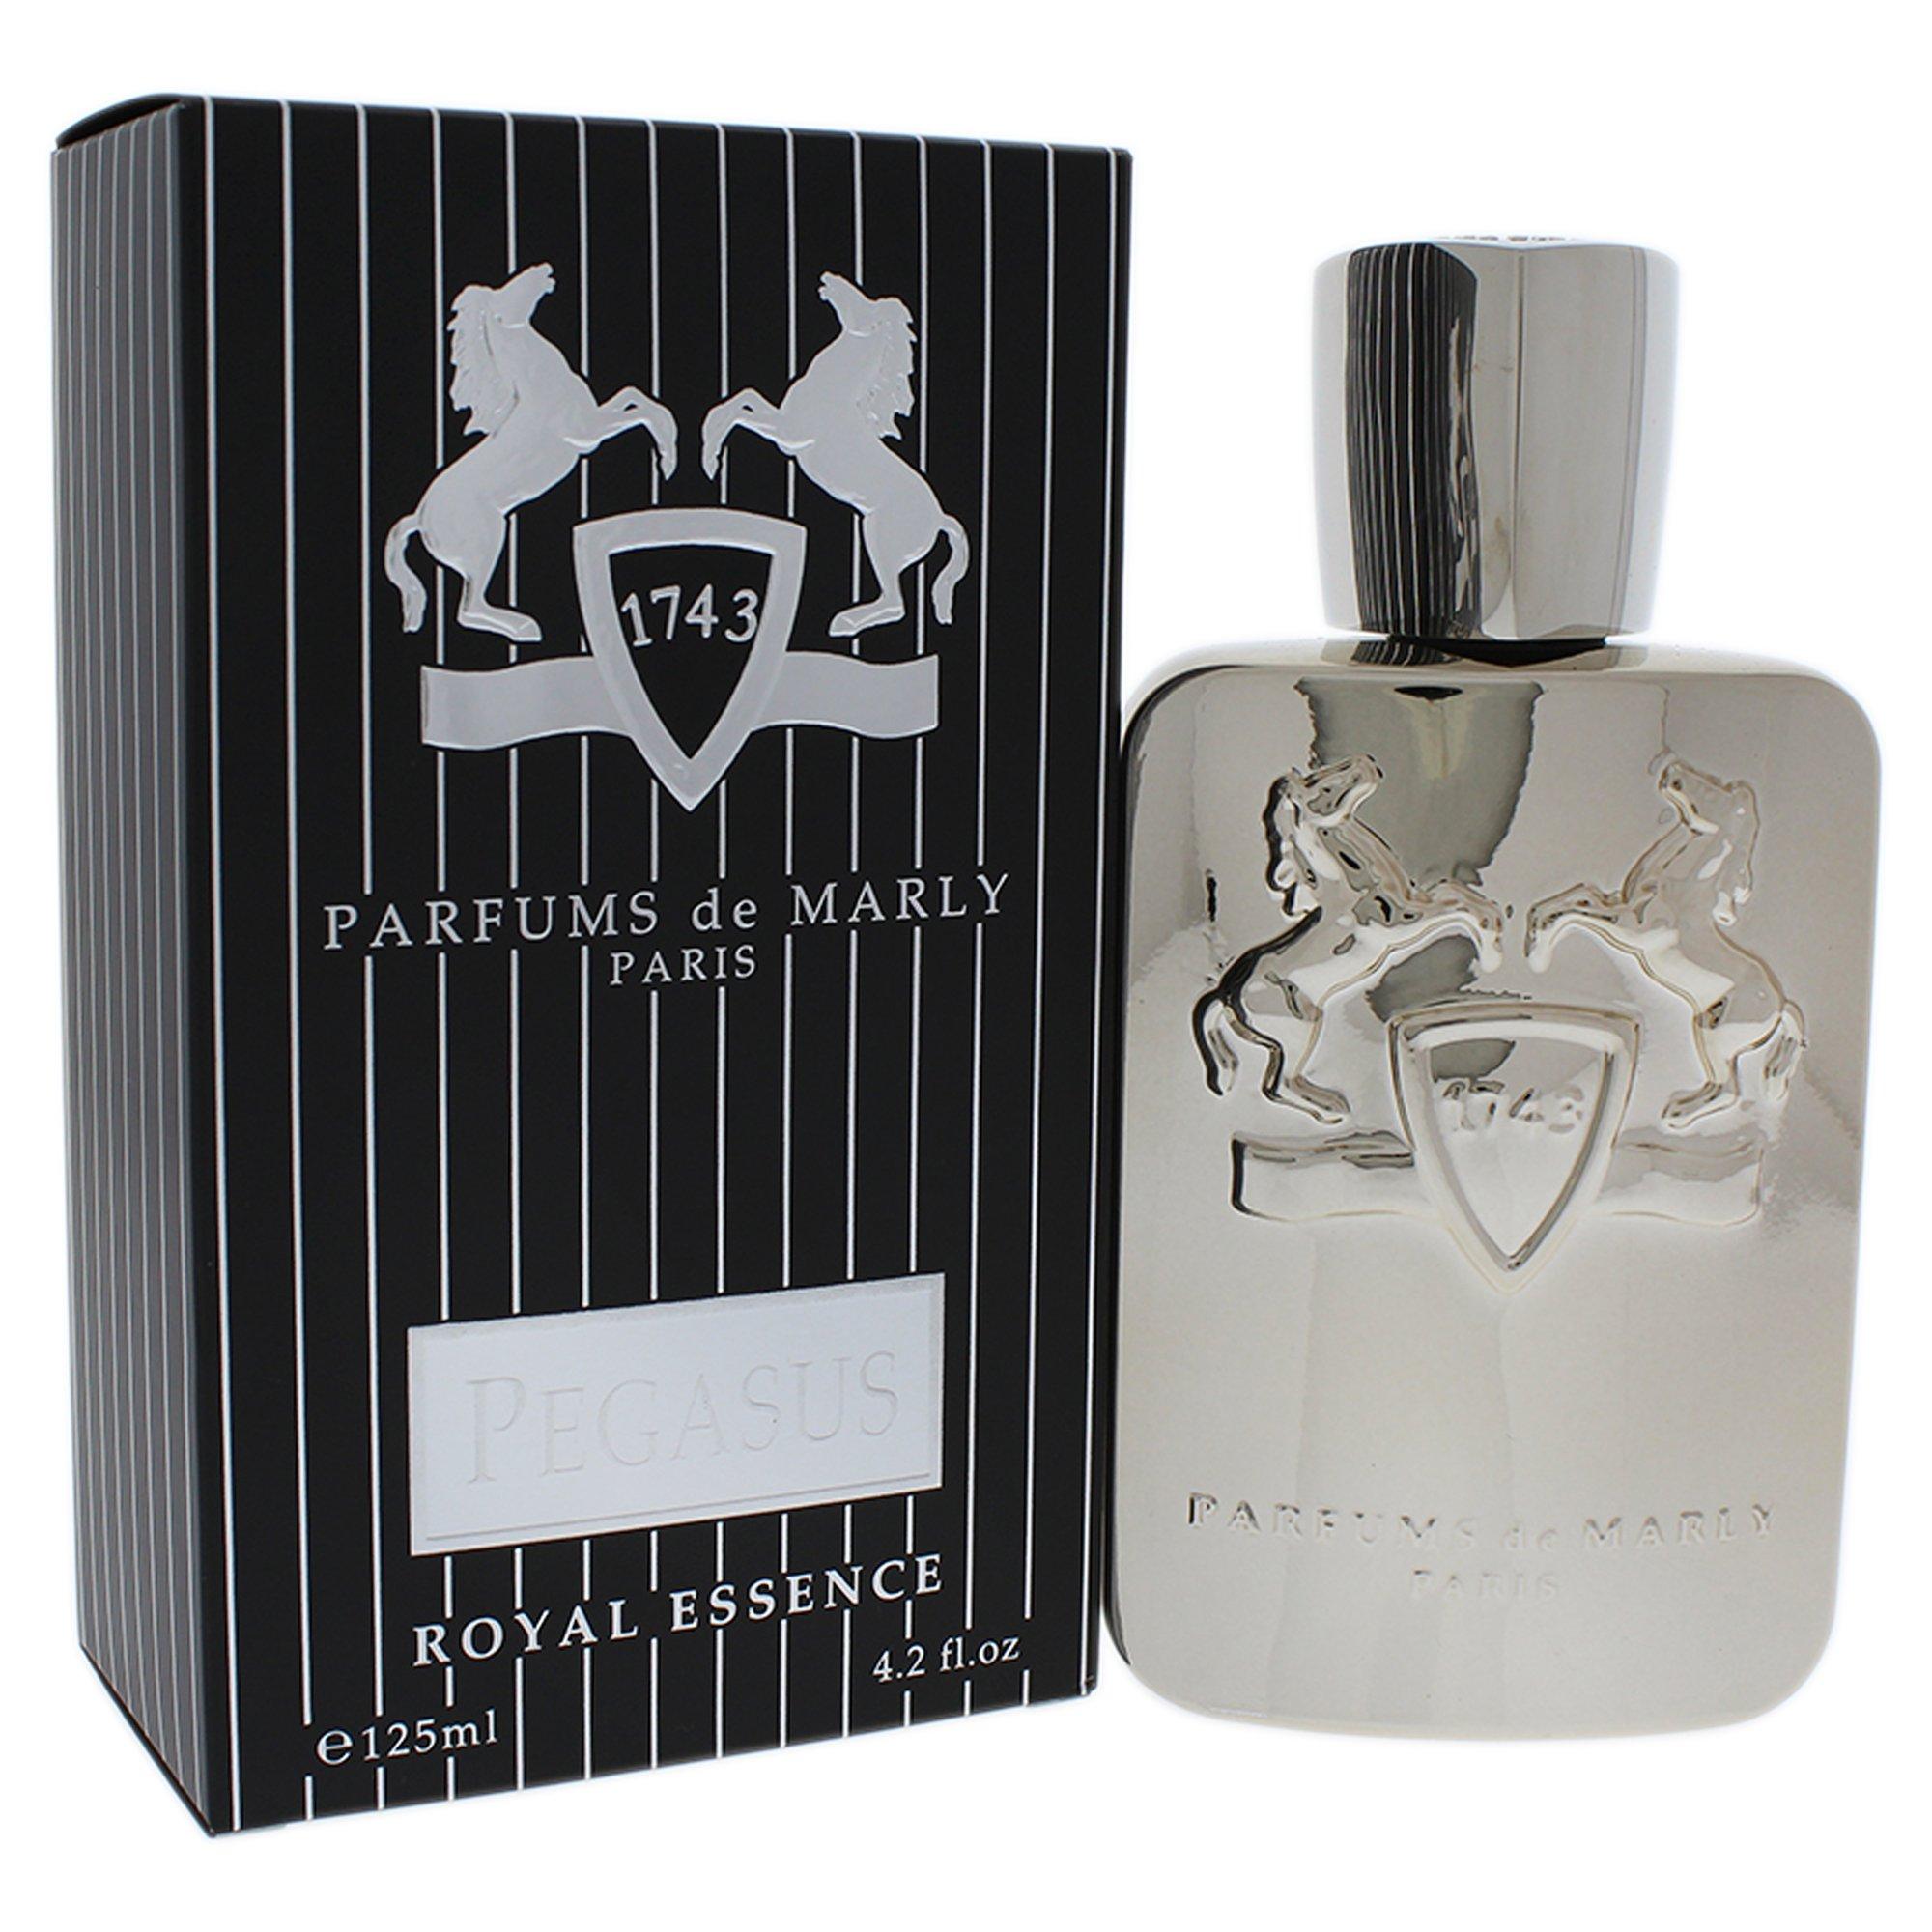 Parfums de Marly Pegasus Men's EDP Spray, 4.2 oz. by Parfums de Marly